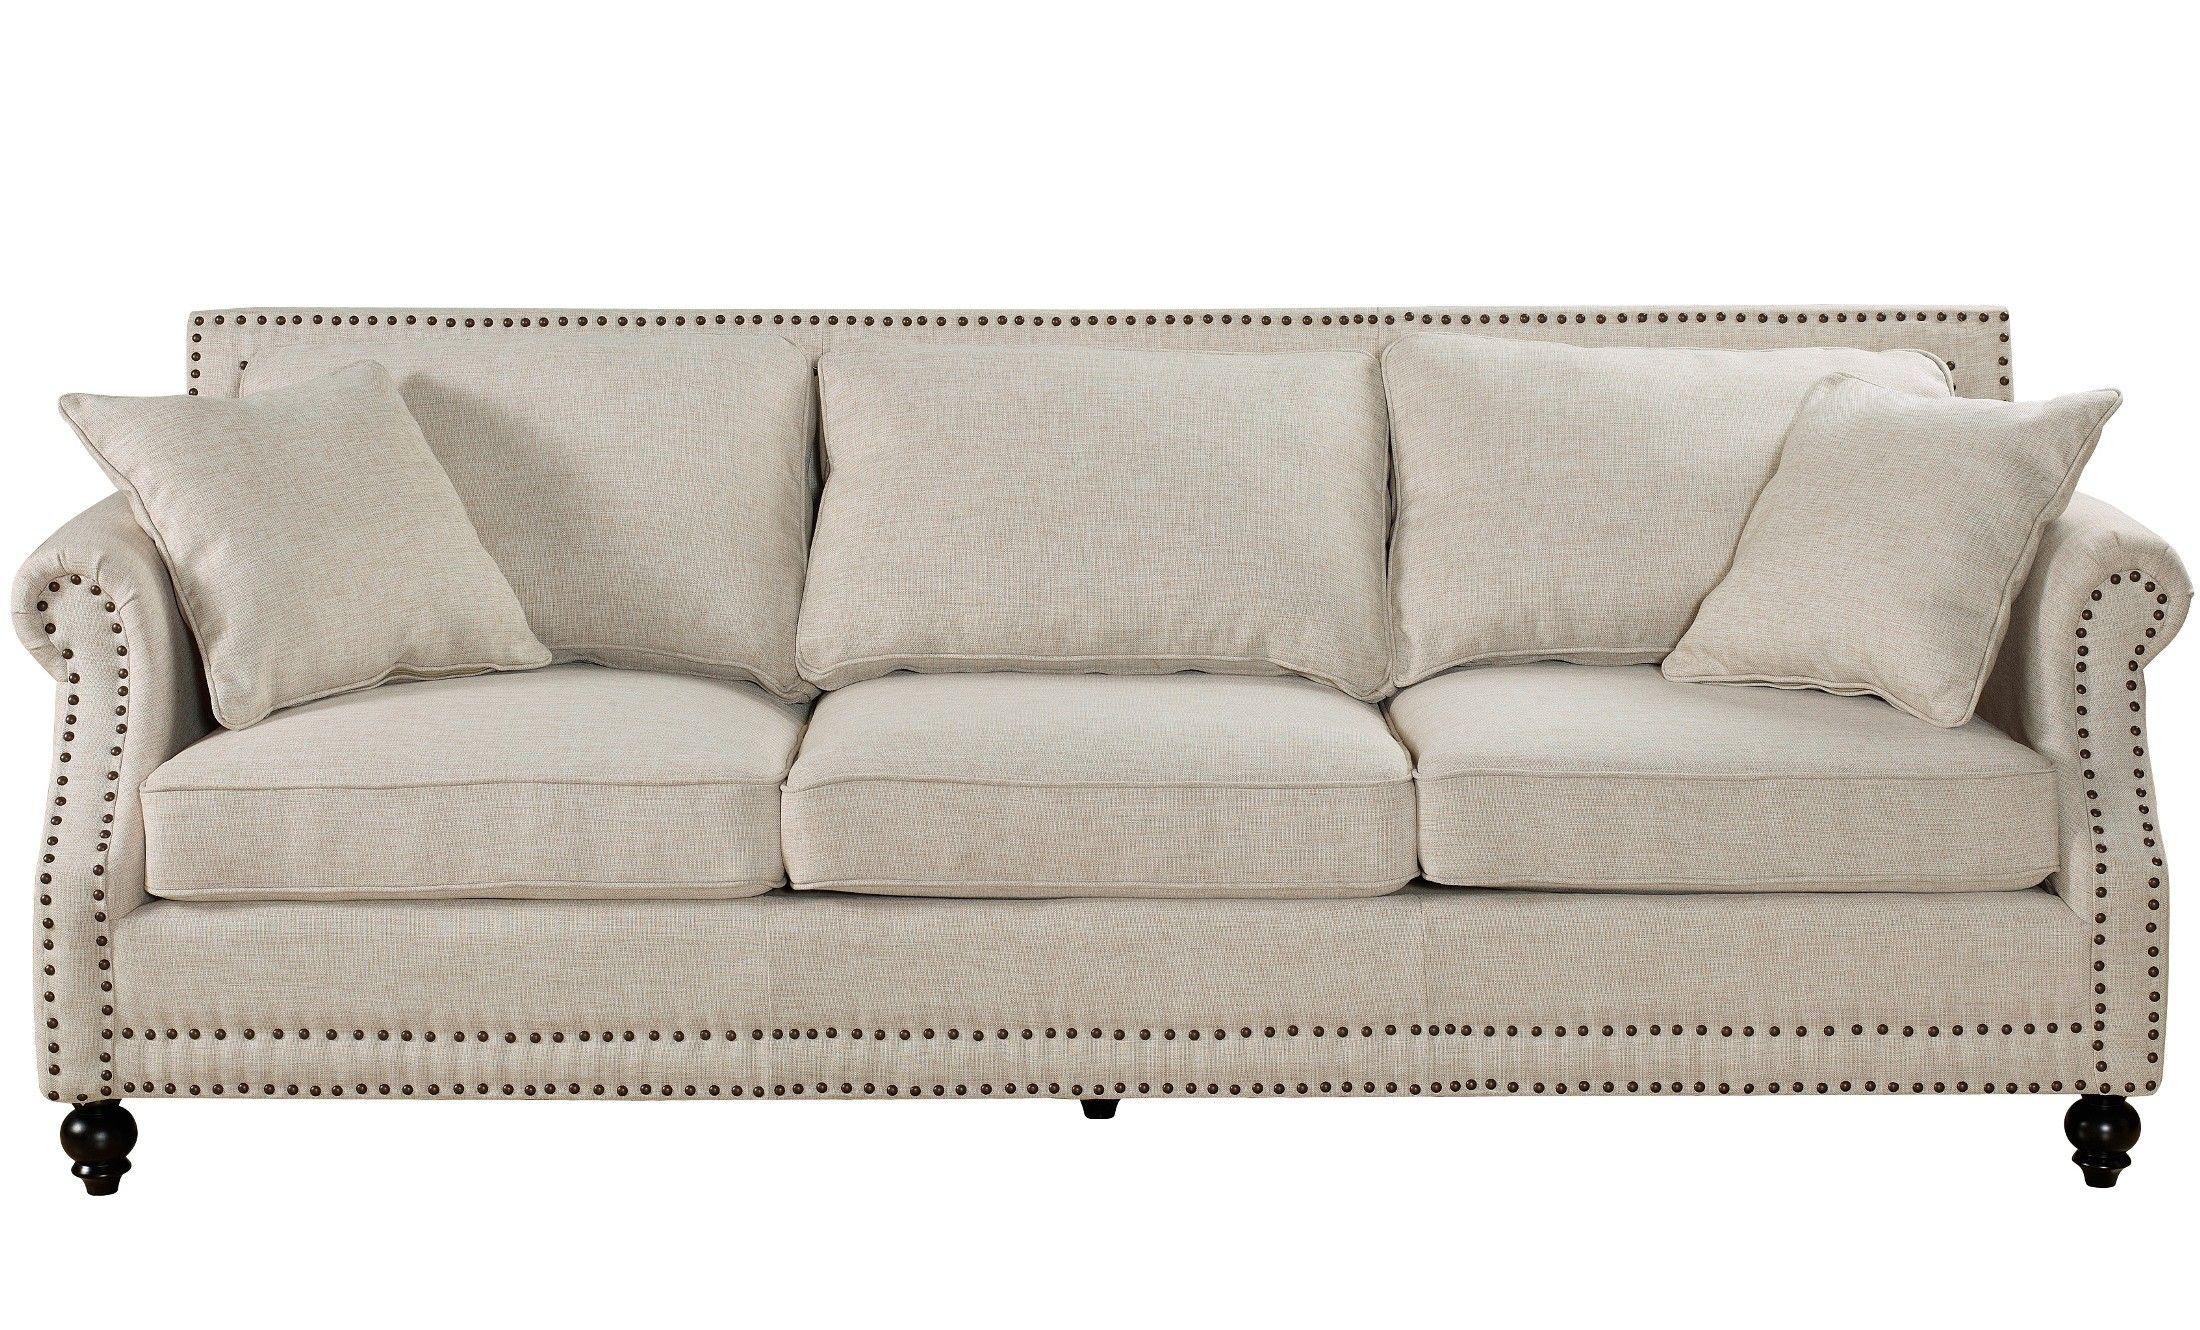 Camden Beige Linen Sofa Sofa Beige Sofa De Lino Decoracion Hogar